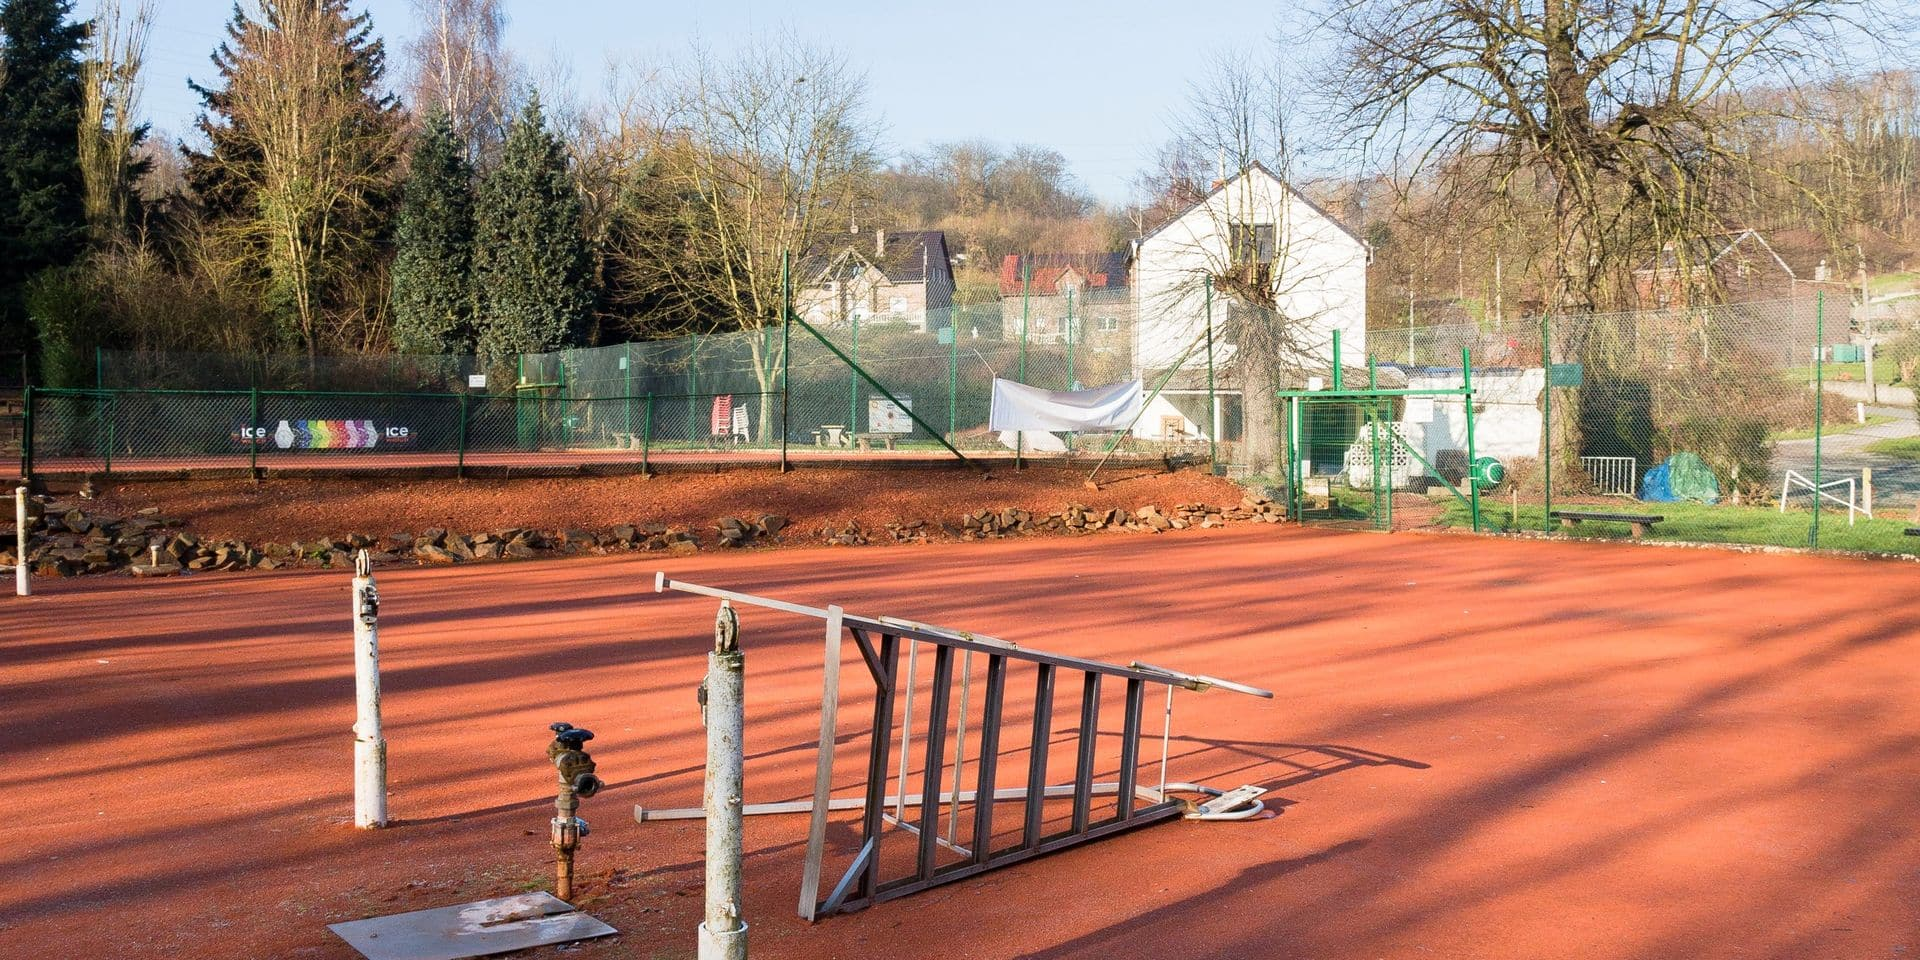 Tennis Club de Glain